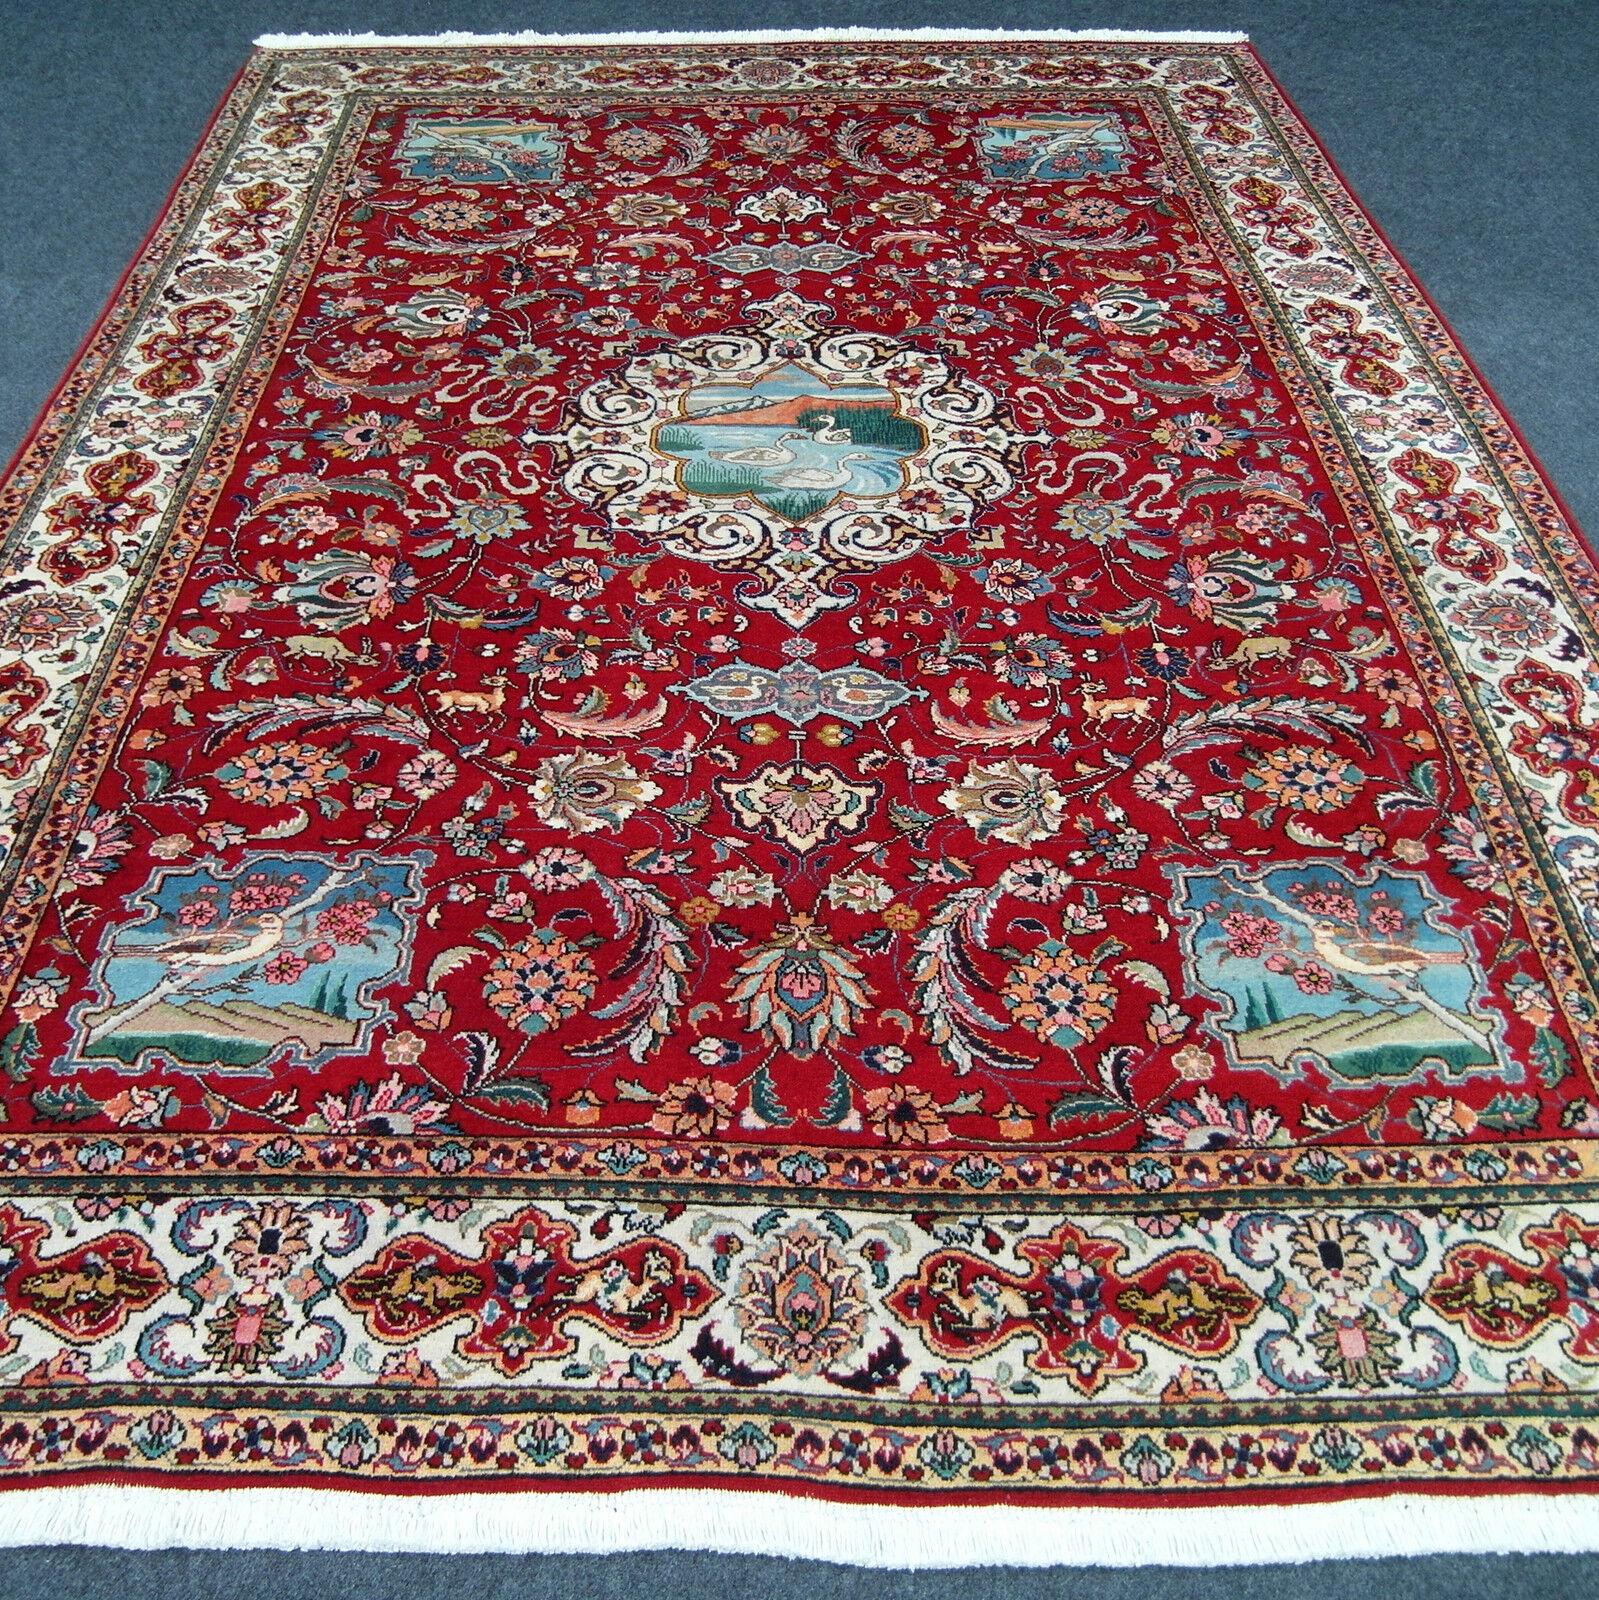 Orient alfombra roja de 345 x 247 cm alfombra persa edad naturaleza motivos old Carpet Rug